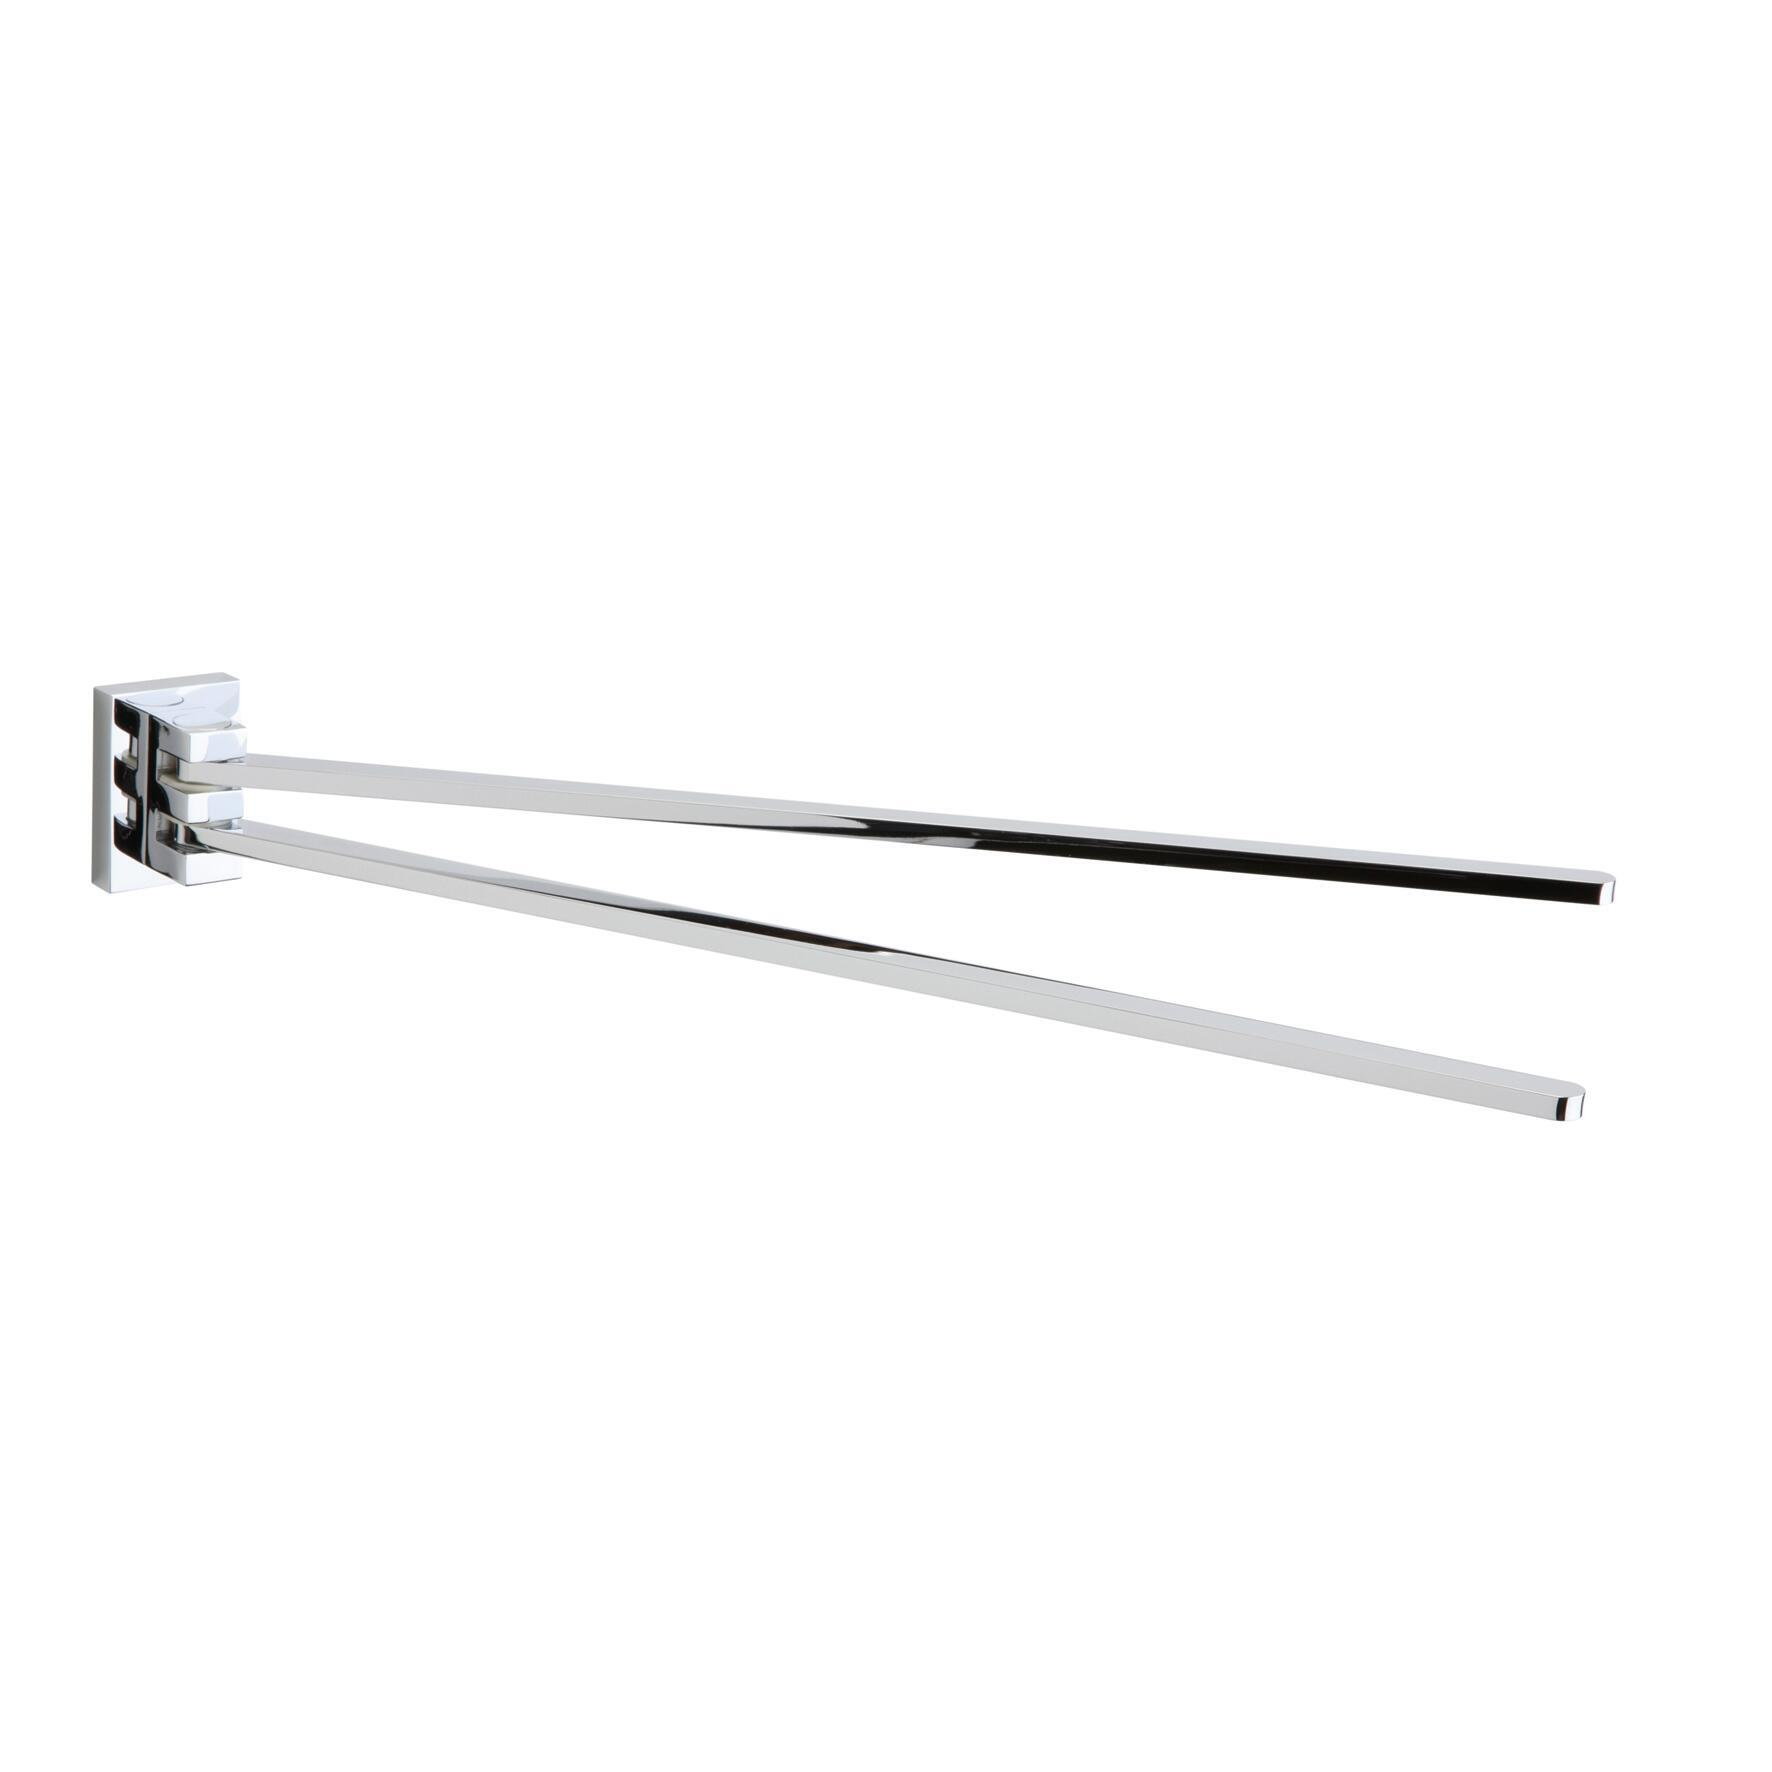 Porta salviette a snodo Smart cromo cromato L 37 cm